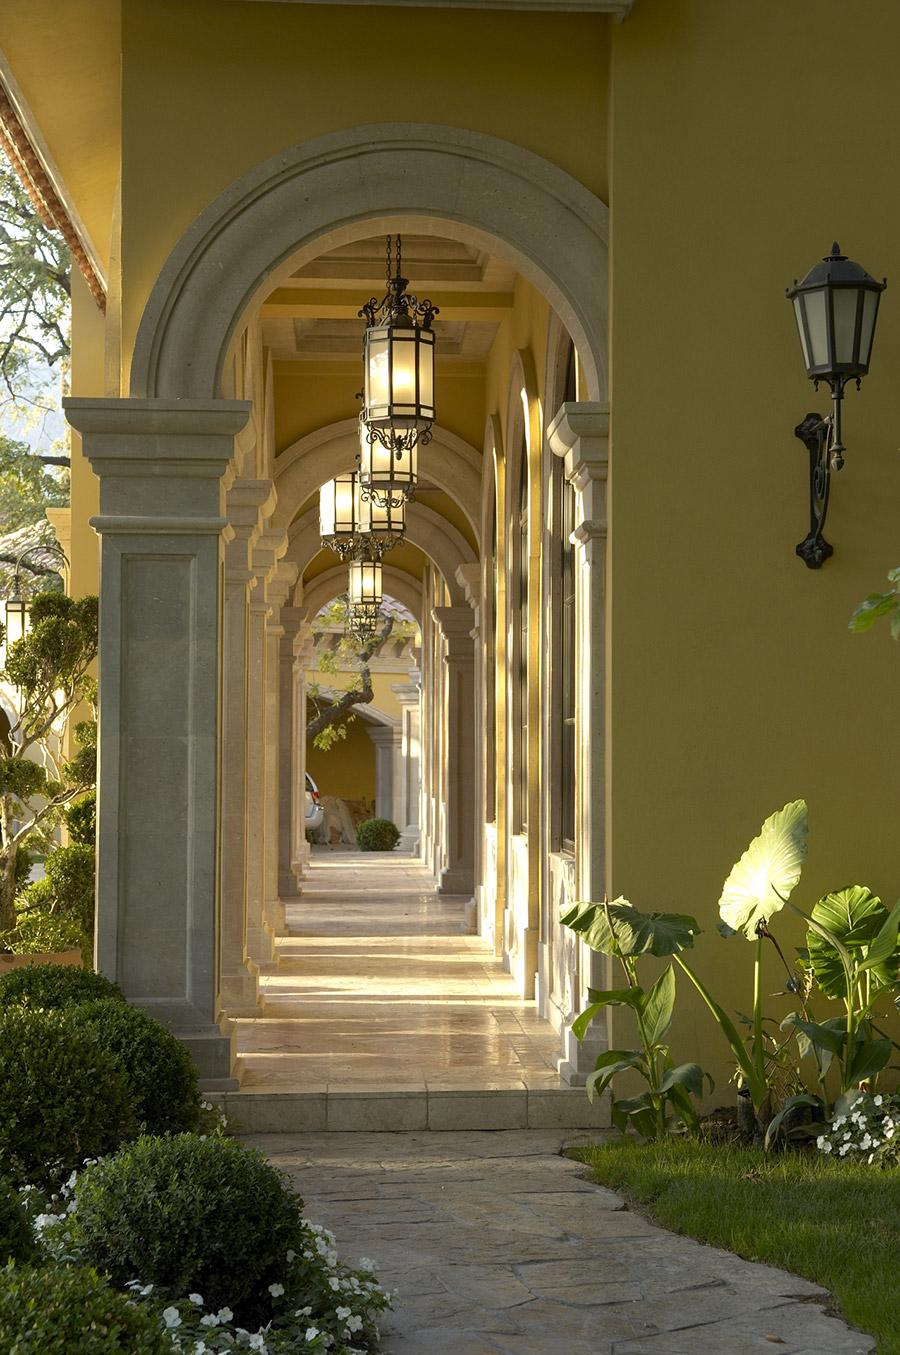 Alexandria-OLS-CLA-F-006-classic-outdoor-Steel-Wall-Mount-Lighting-Santa-Barbara-Residence-(2)